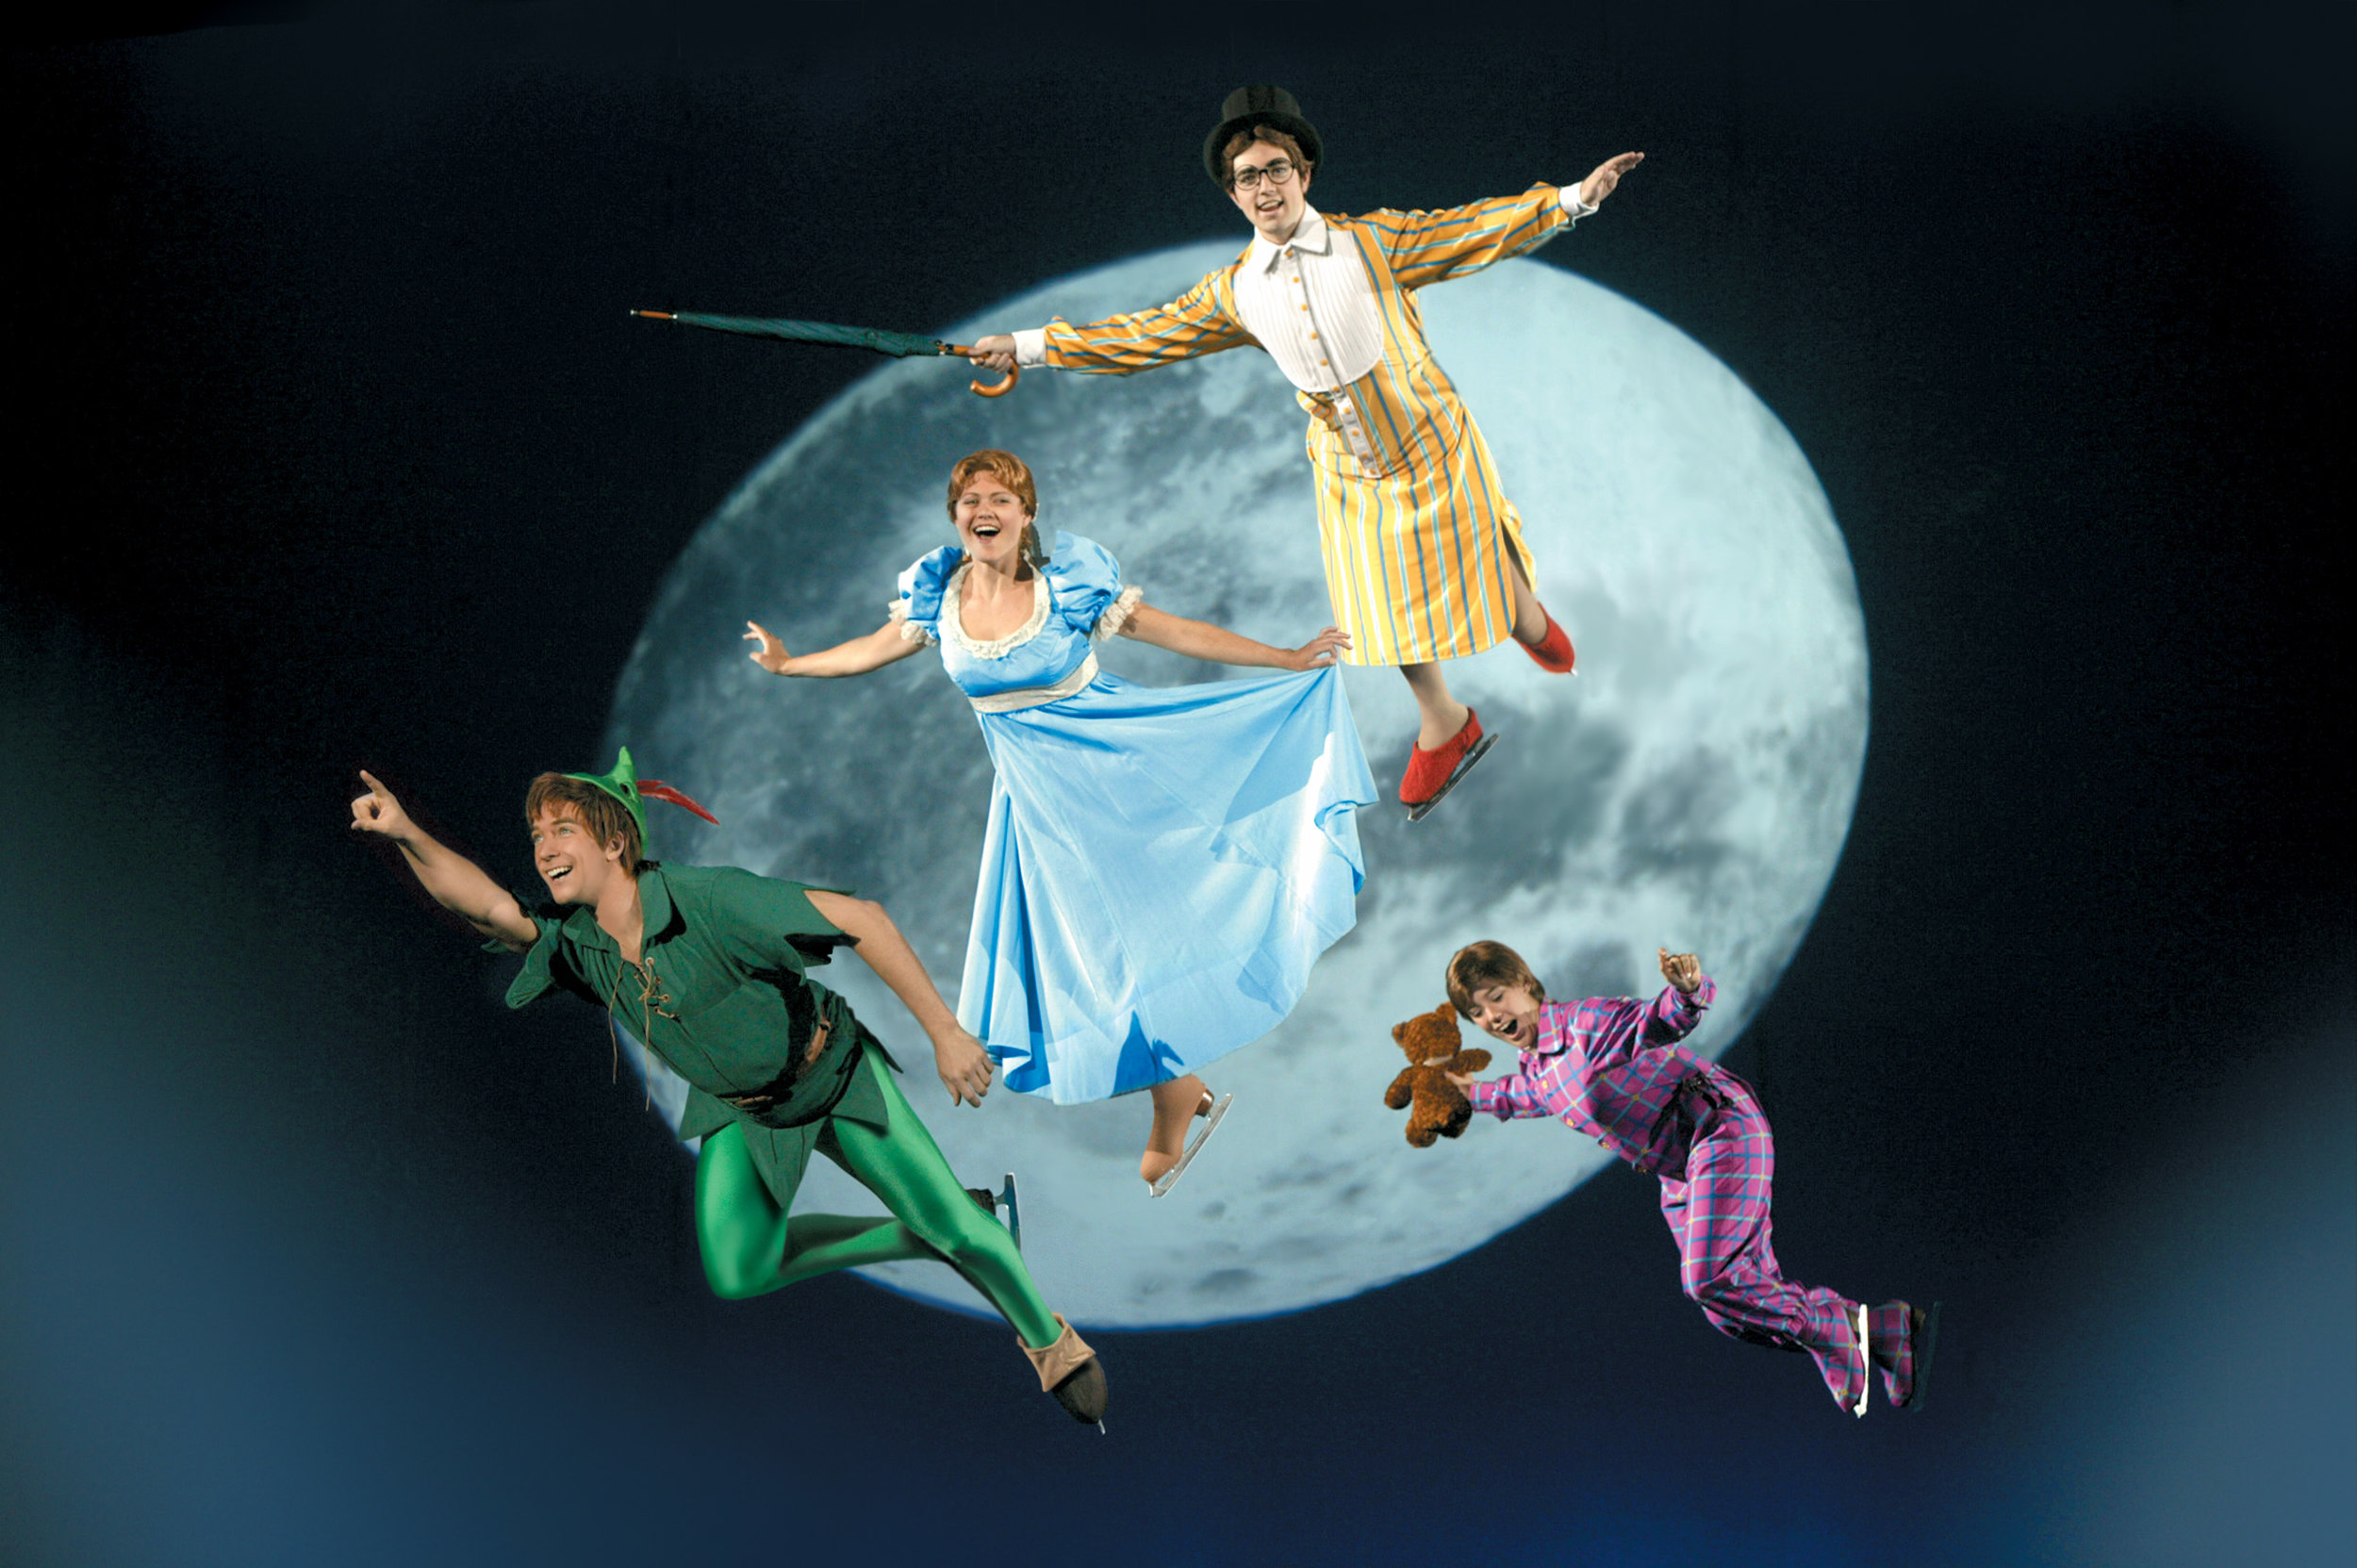 Disney On Ice presents Passport to Adventure - Peter Pan